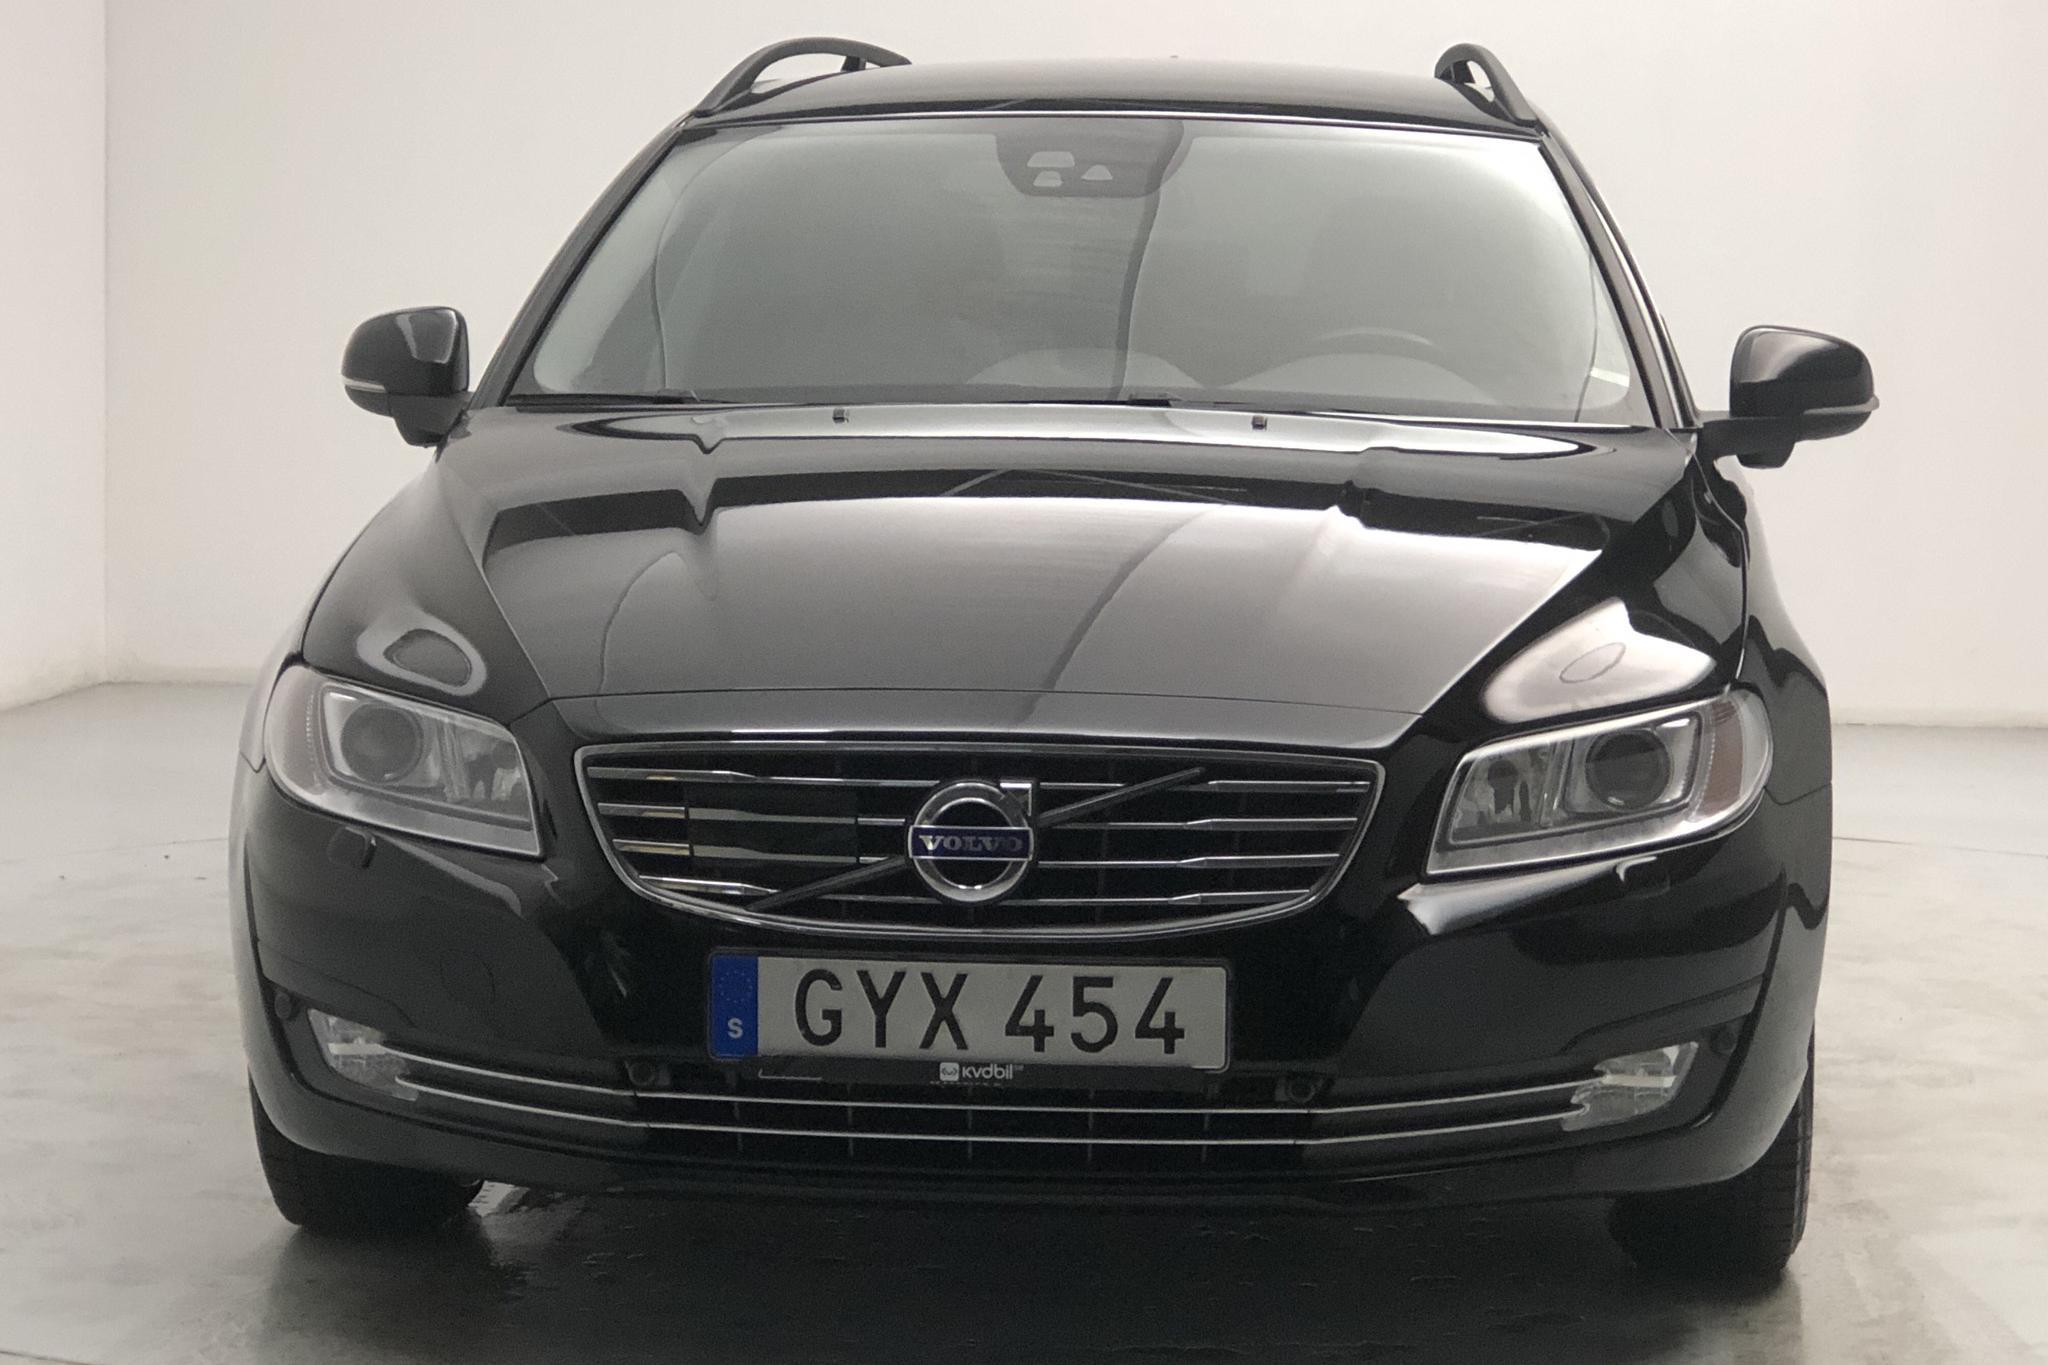 Volvo V70 II D4 AWD (181hk) - 84 240 km - Automatic - black - 2016